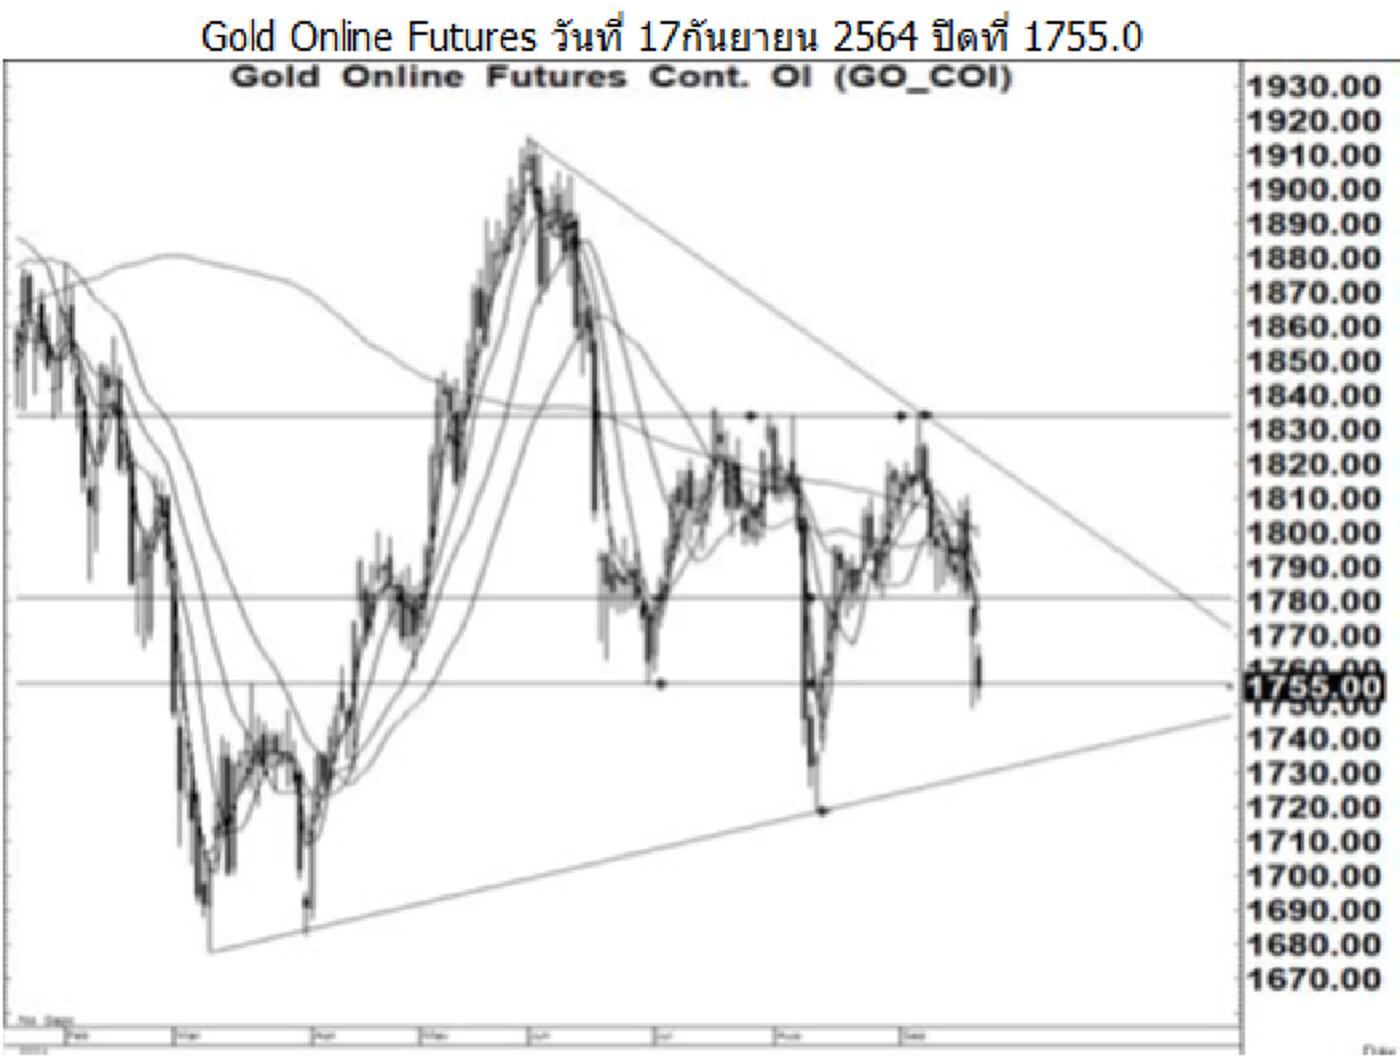 Daily Gold Futures (วันที่ 20 กันยายน 2564)